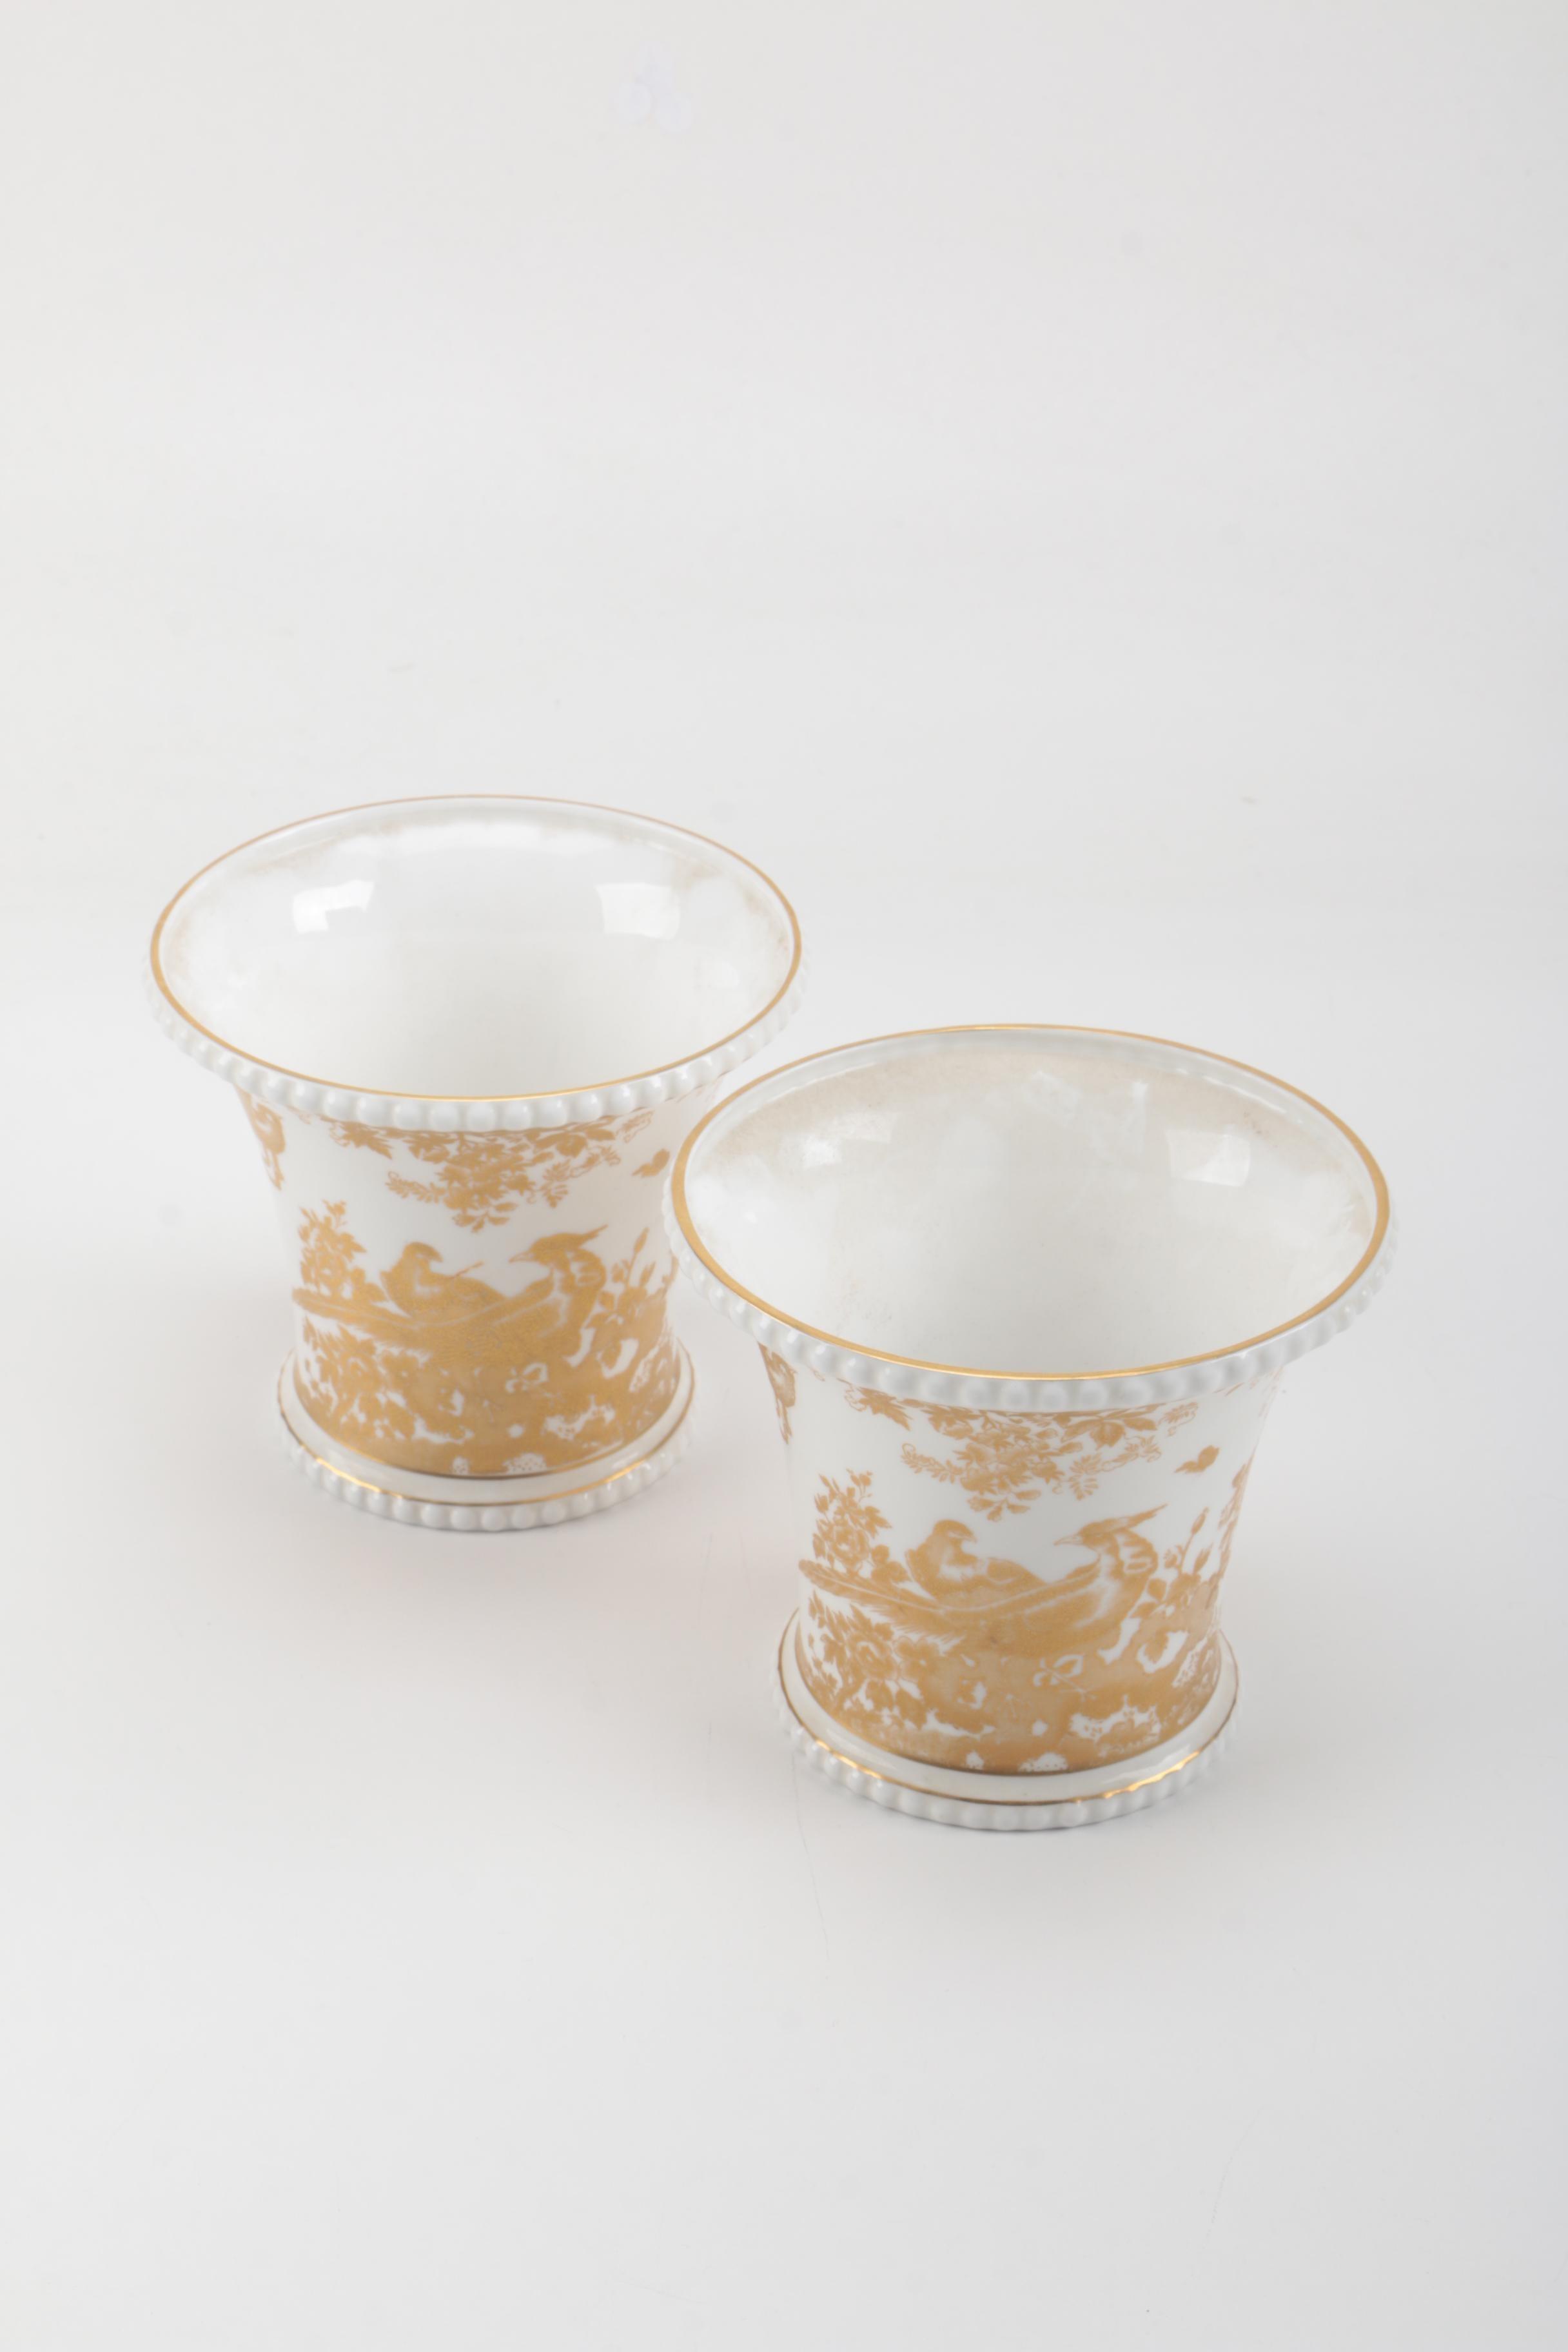 Royal Crown Derby 'Gold Aves' Bone China Vases